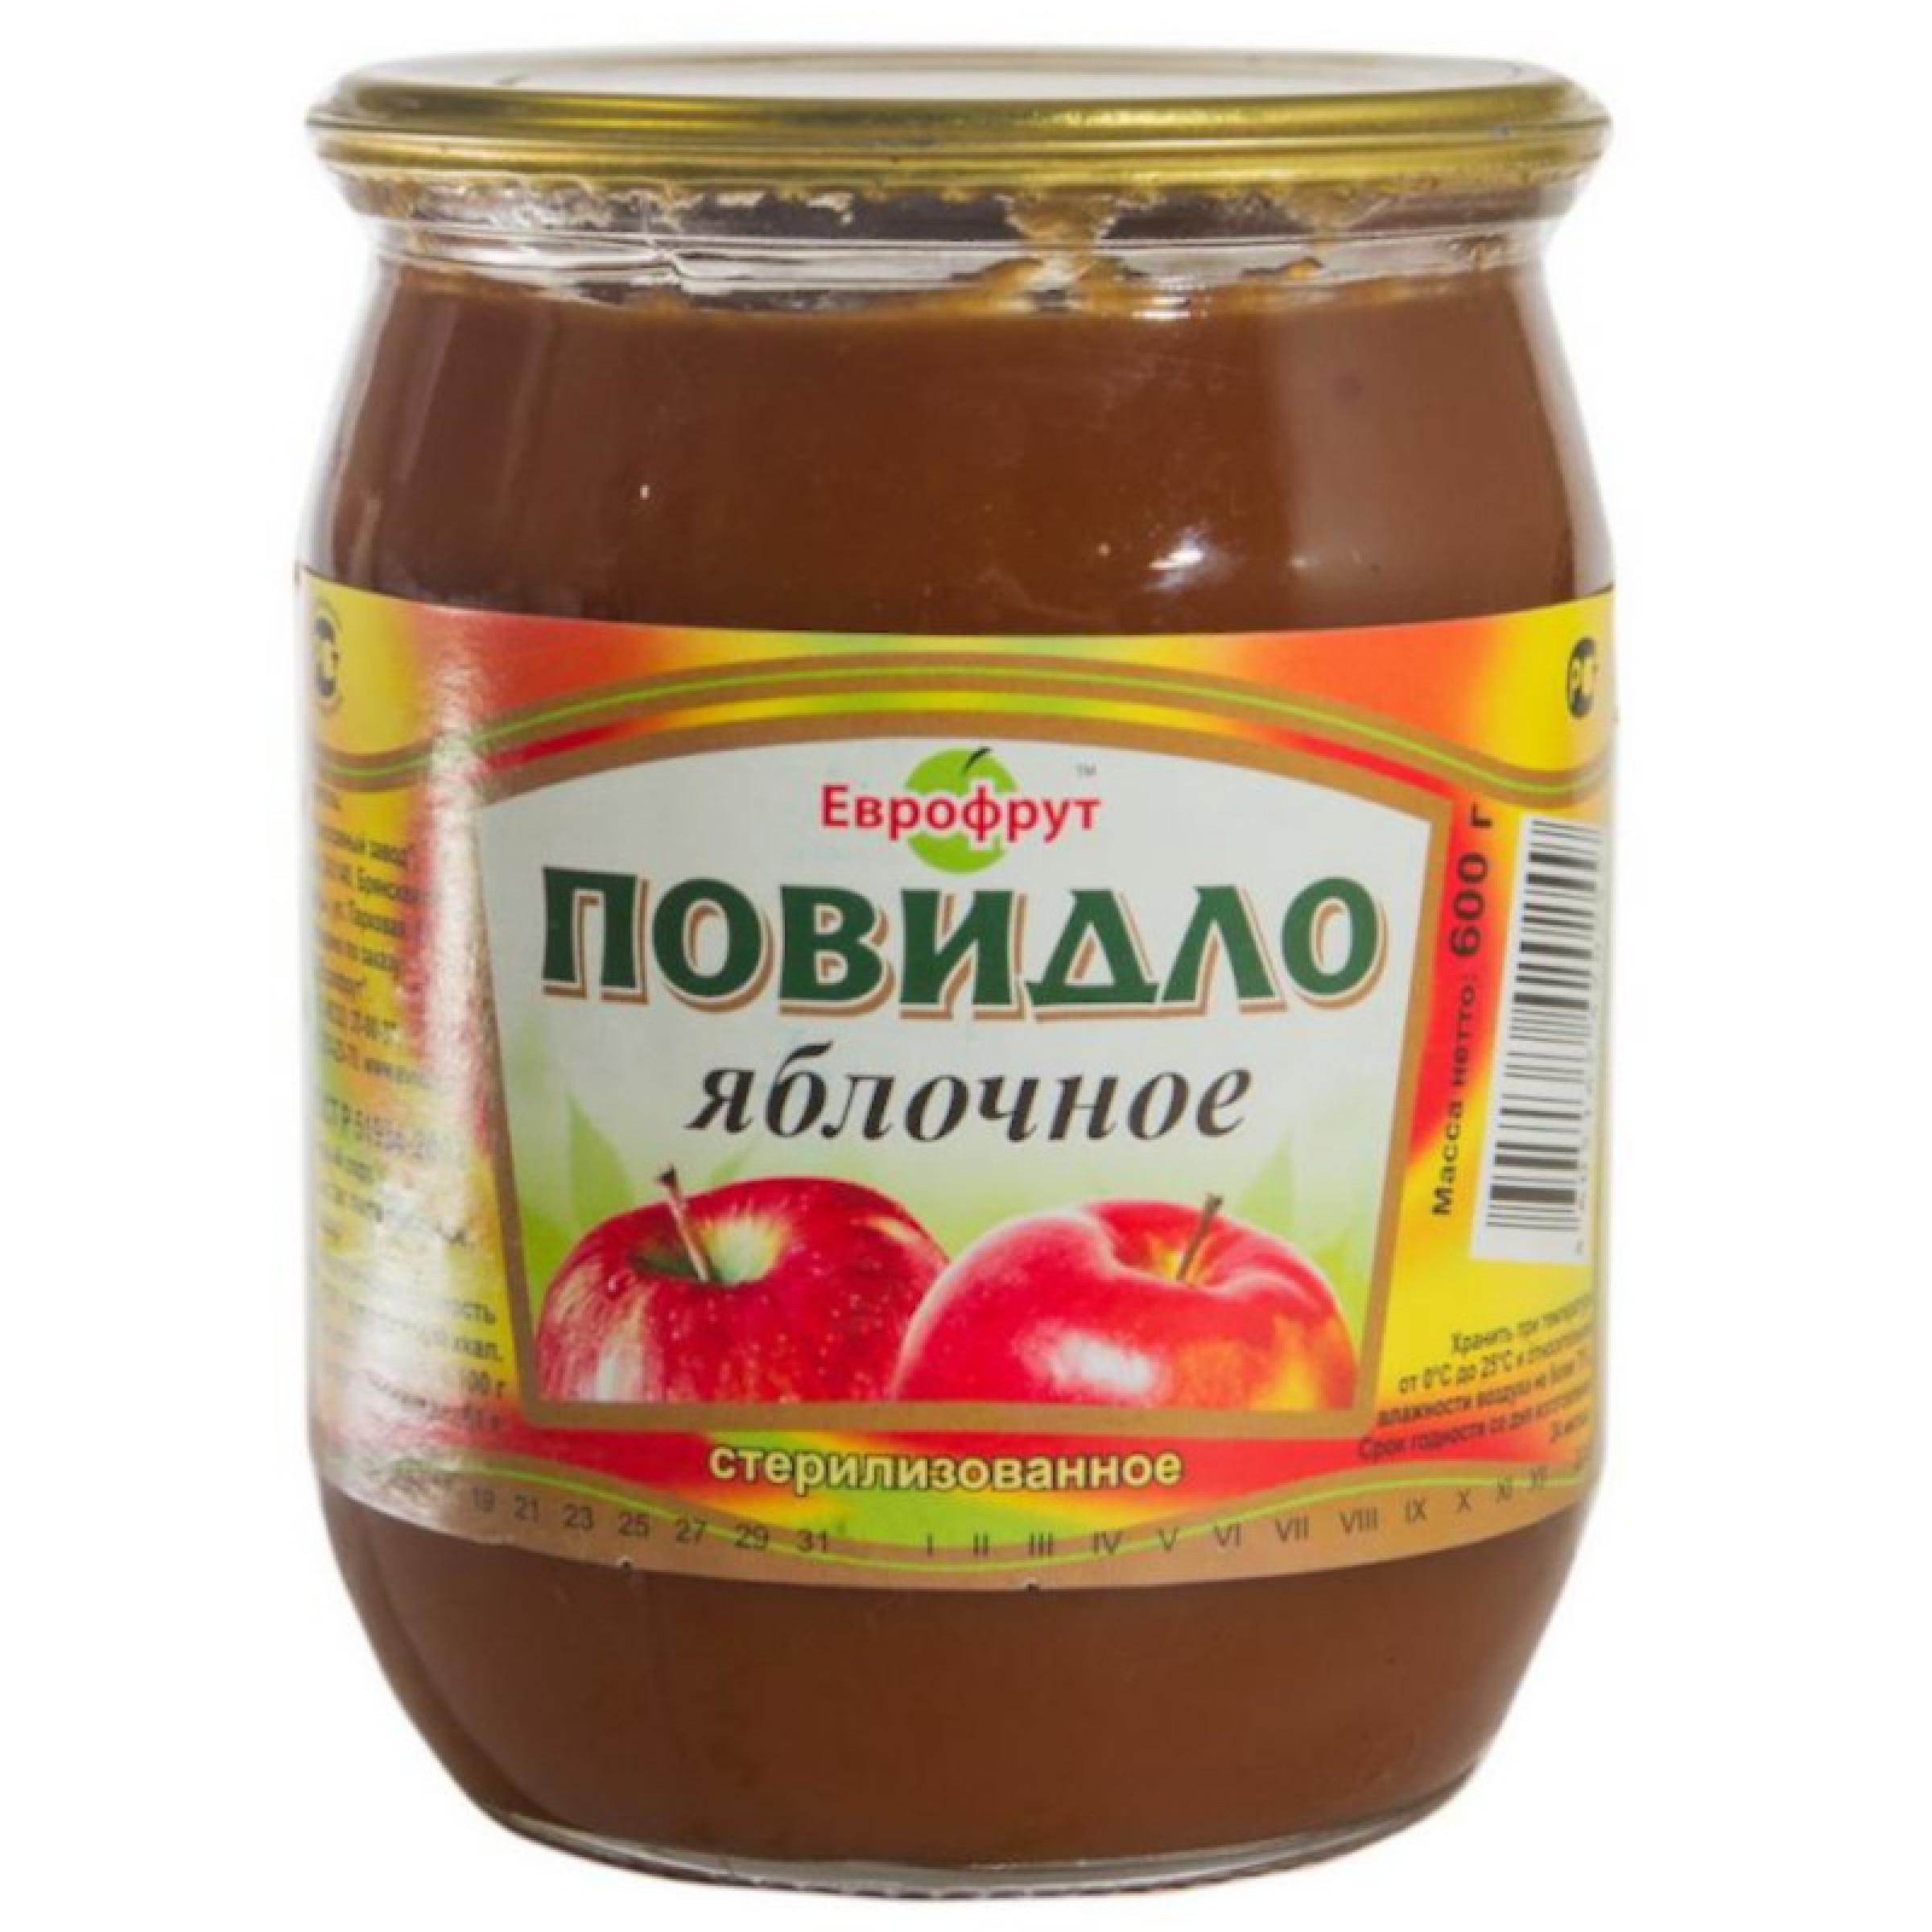 "Повидло яблочное ГОСТ ""Клинцы"", 600гр"